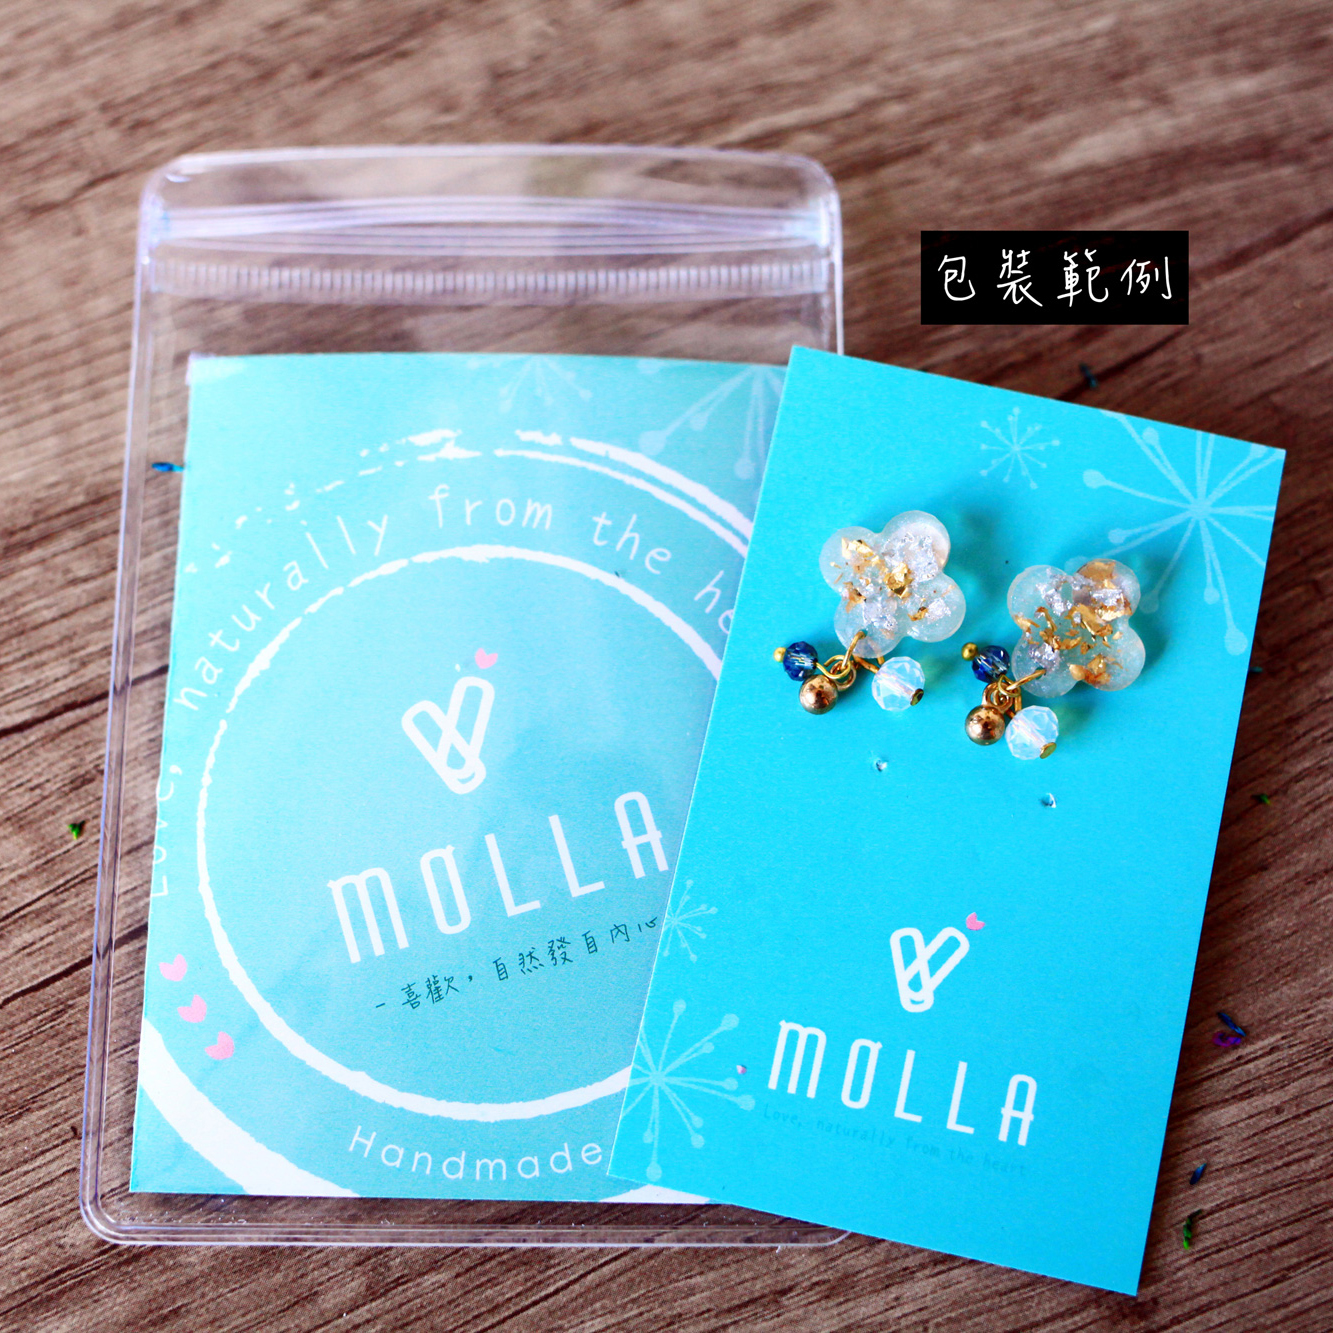 Molla 想討抱抱臘腸狗吊飾(女生最愛手作吊飾、鑰匙圈、手機吊飾)